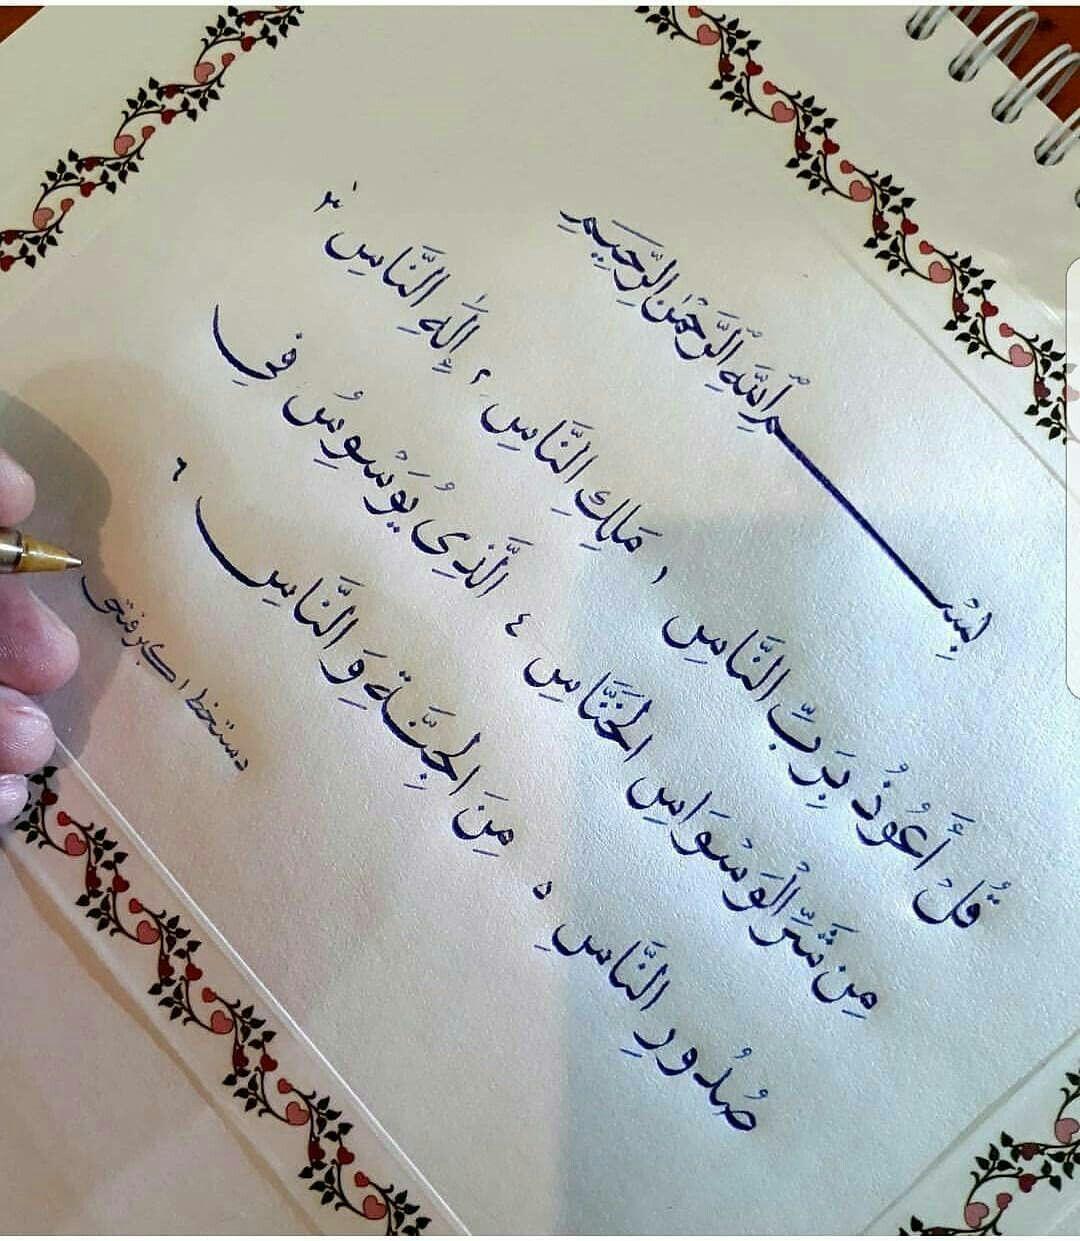 Pin By Bleu Eyes On Beautiful Handwriting And Fonts Islamic Calligraphy Quran Islamic Calligraphy Quran